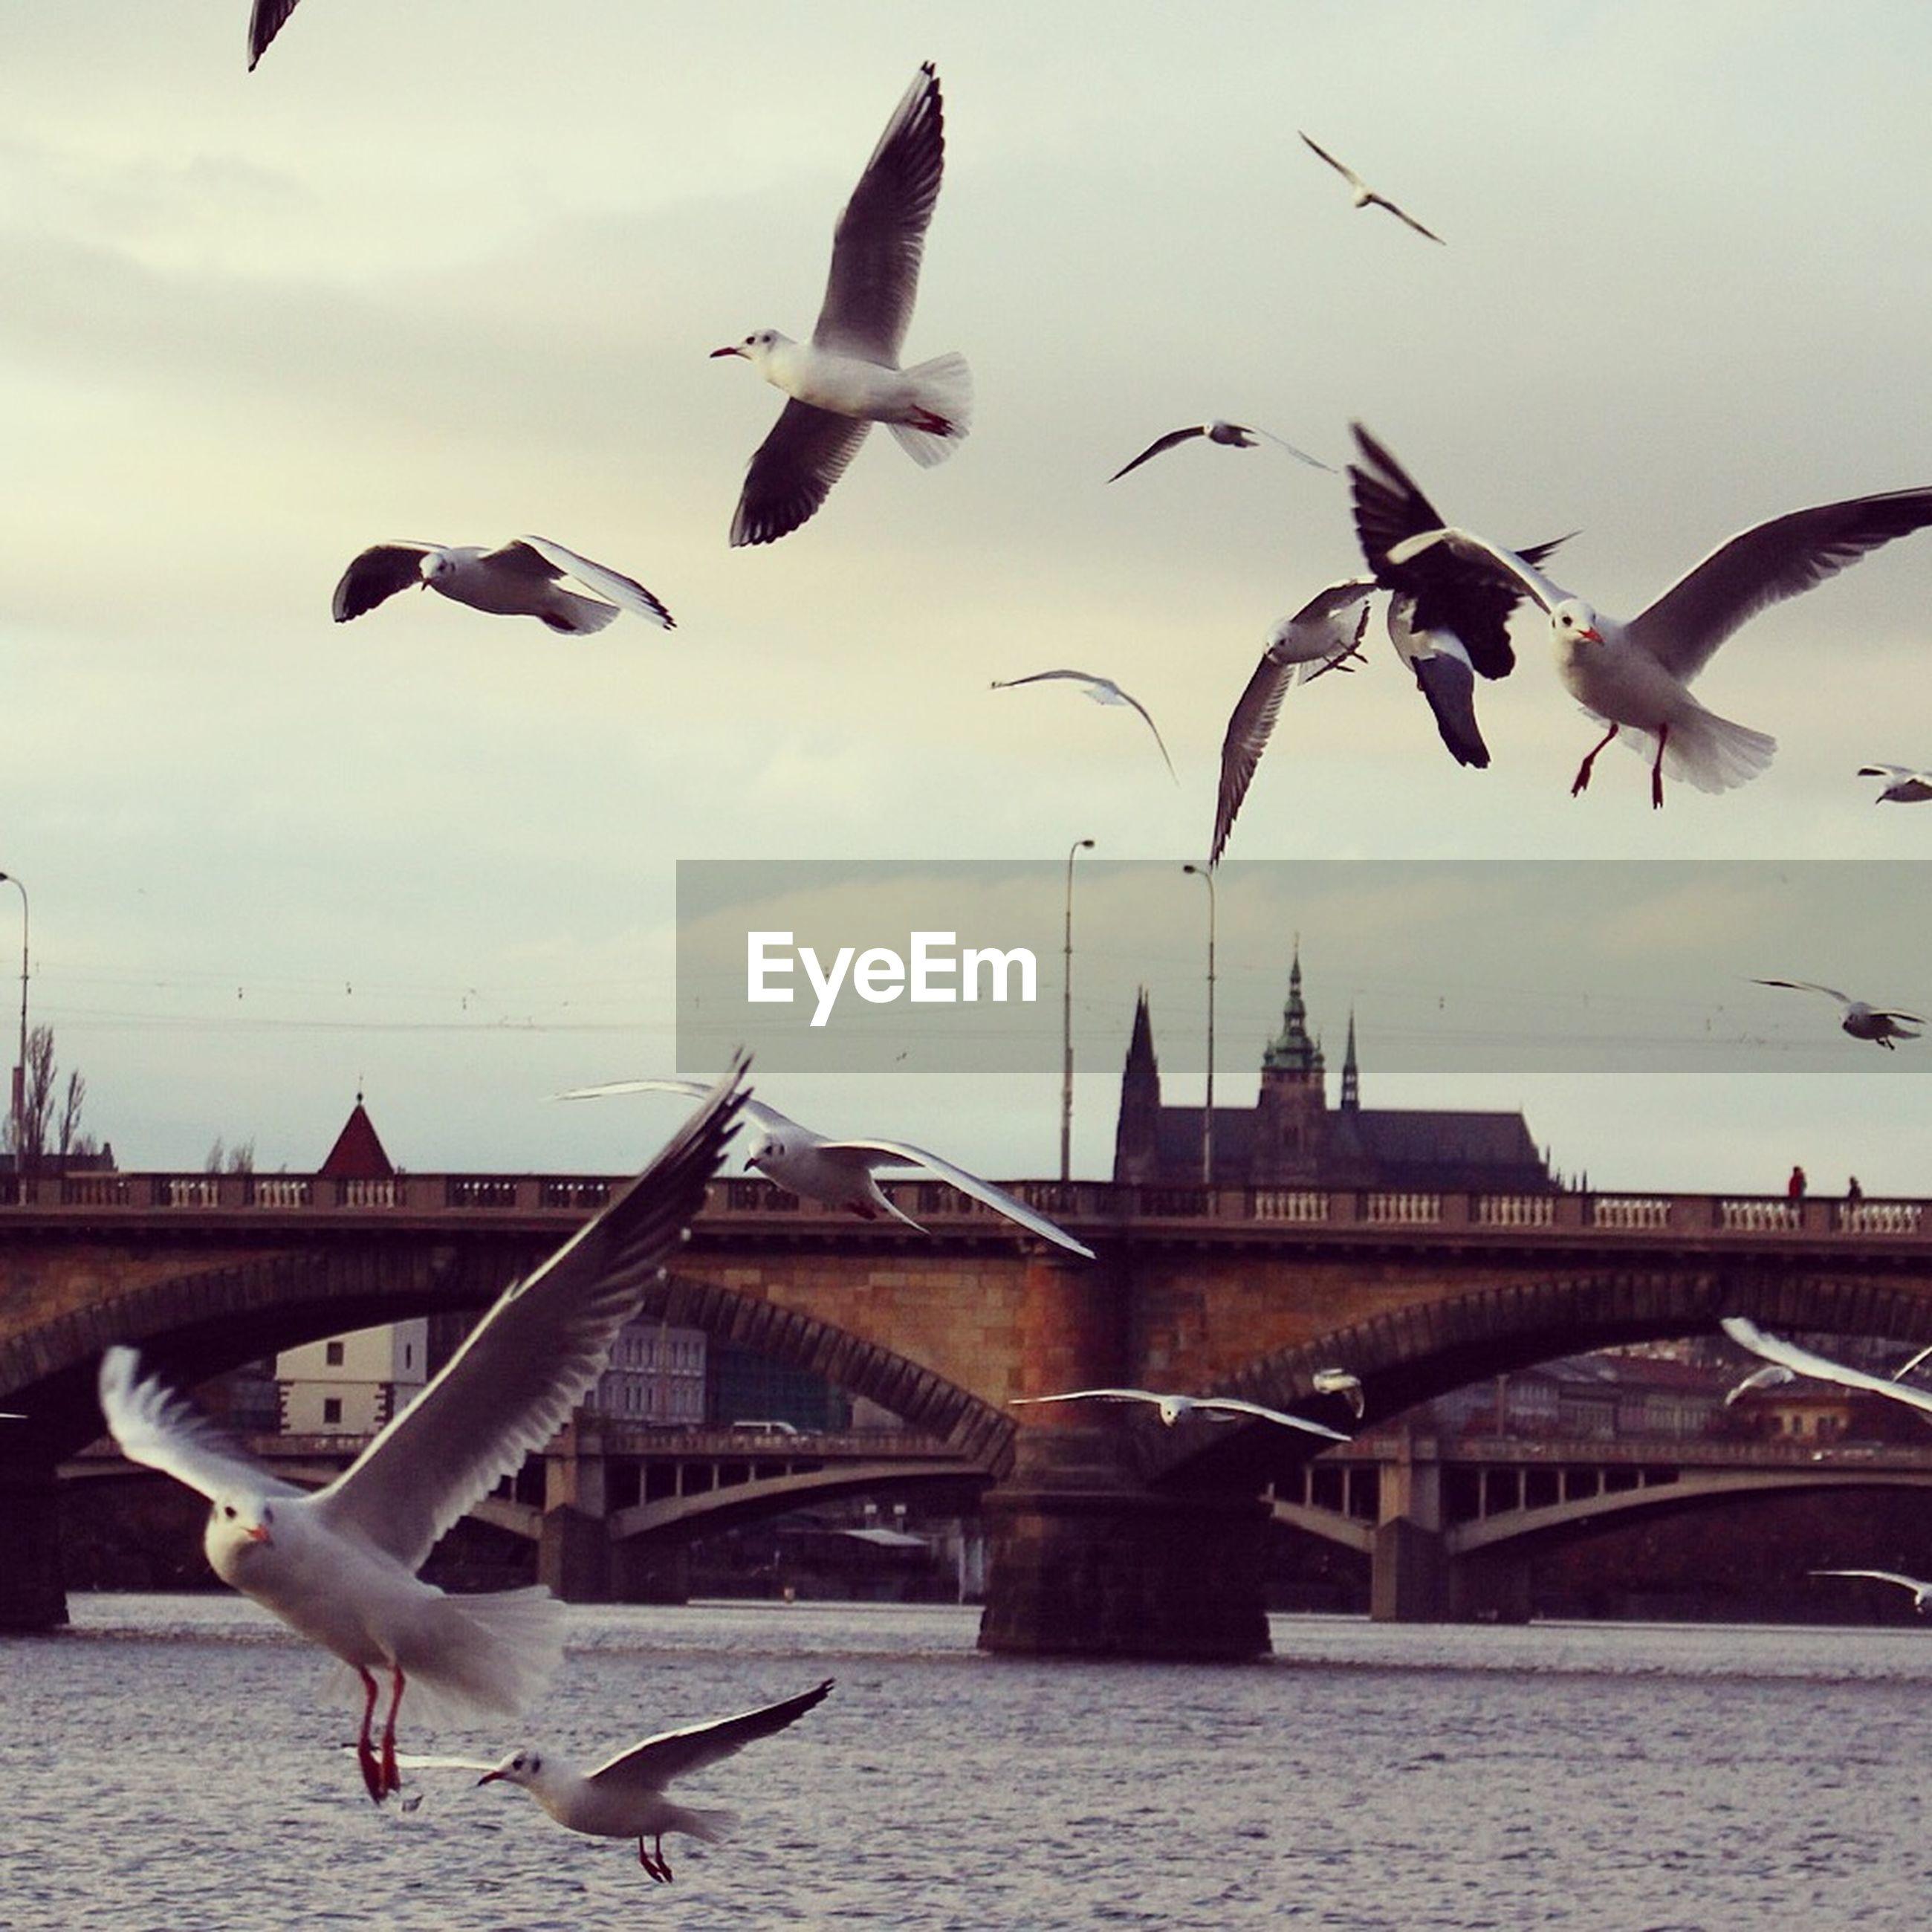 Seagulls flying over river against sky